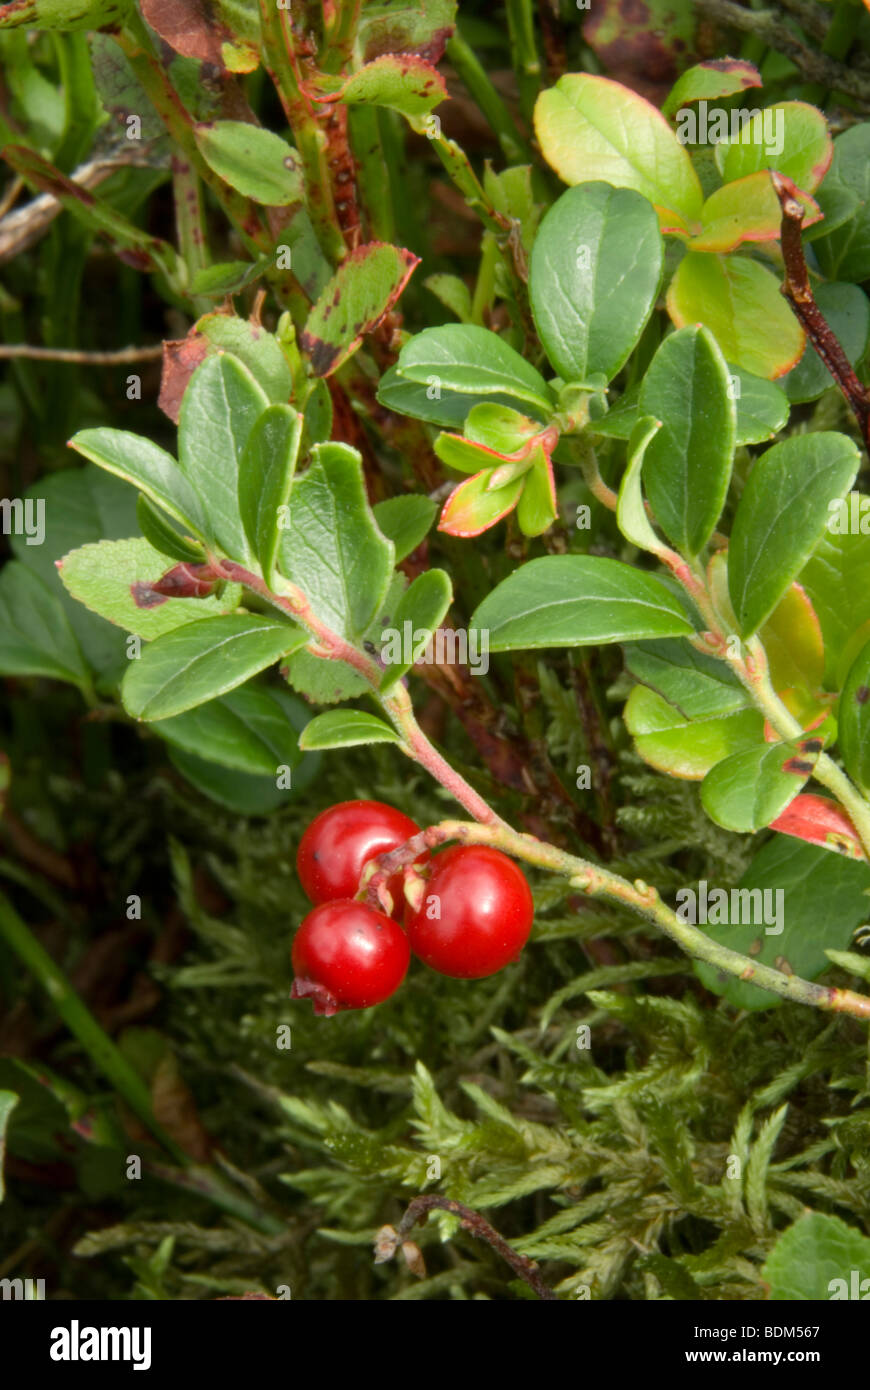 Bearberry, Arctostaphylos uva-ursi - Stock Image